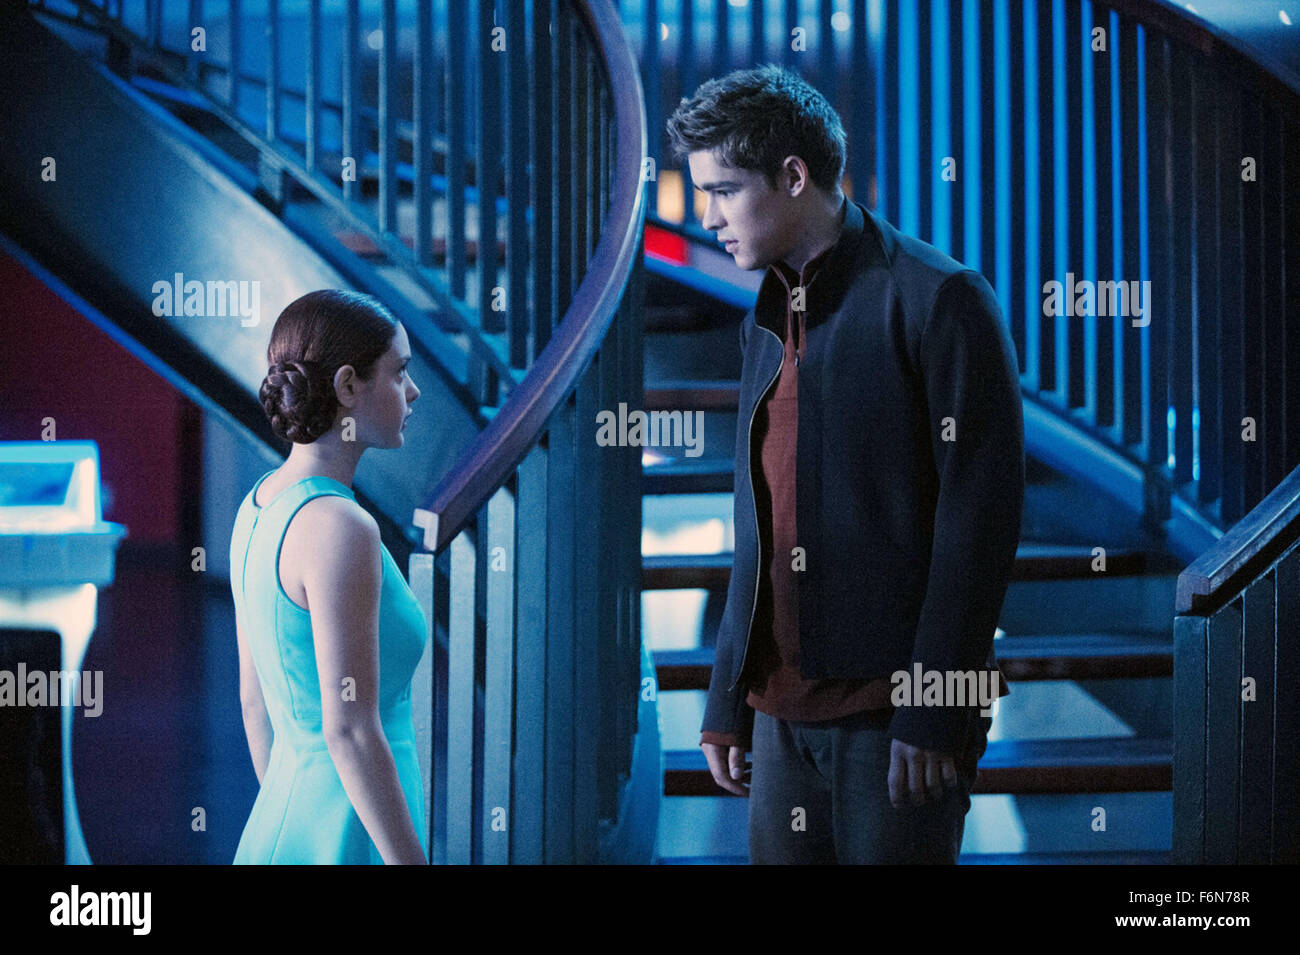 Sept 9 2014 Los Angeles Movie Stills THE GIVER 2014